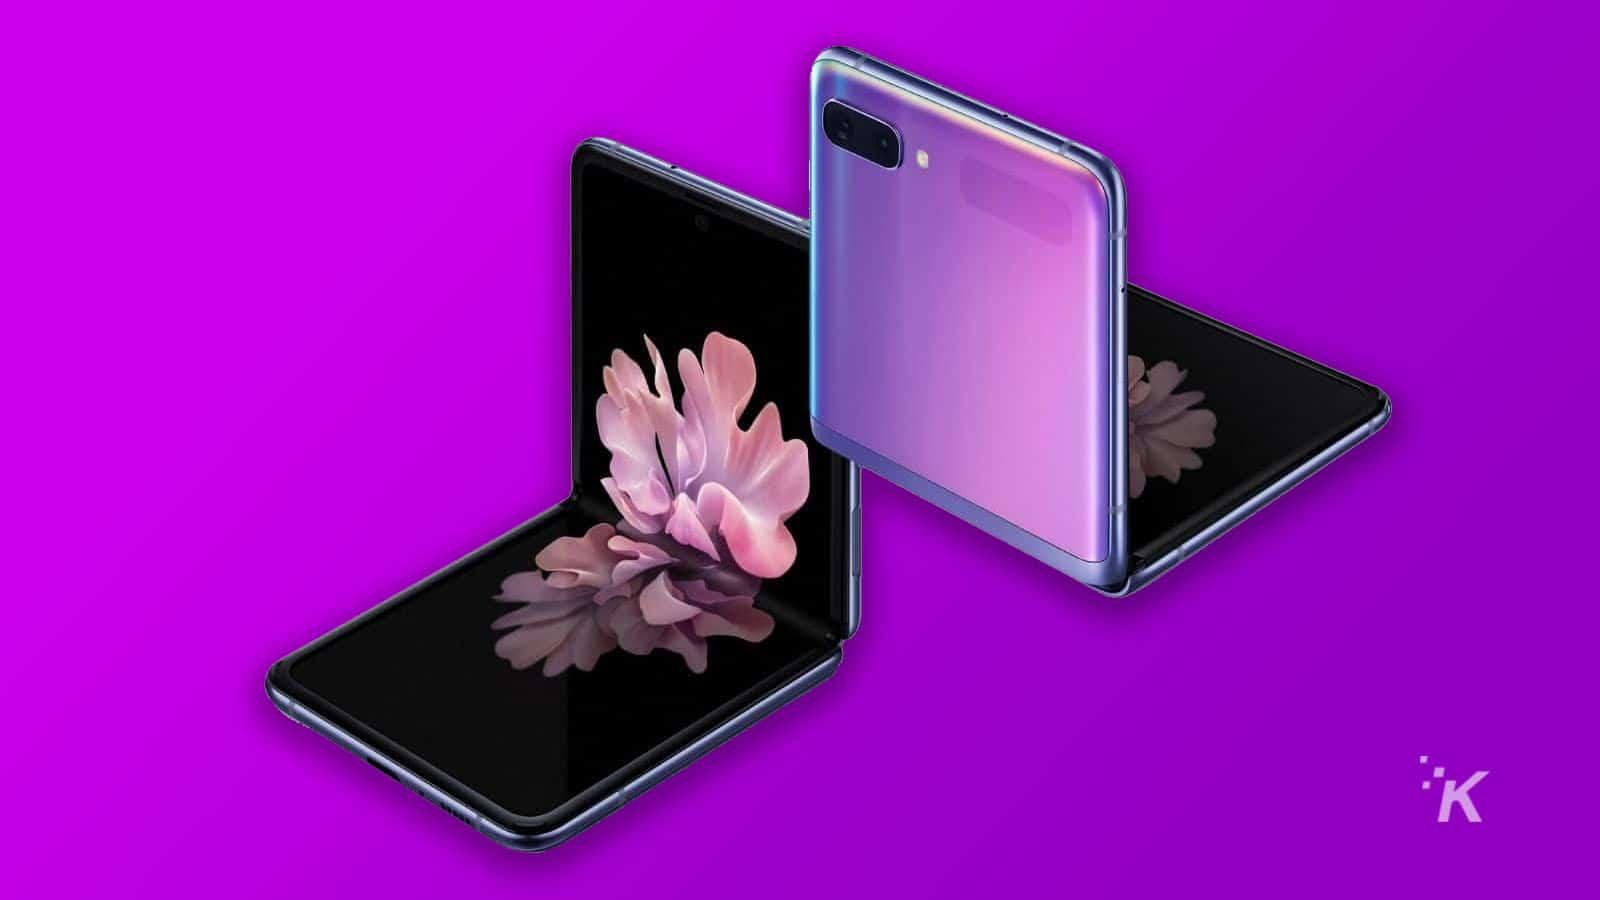 samsung galaxy z flip phone on purple background